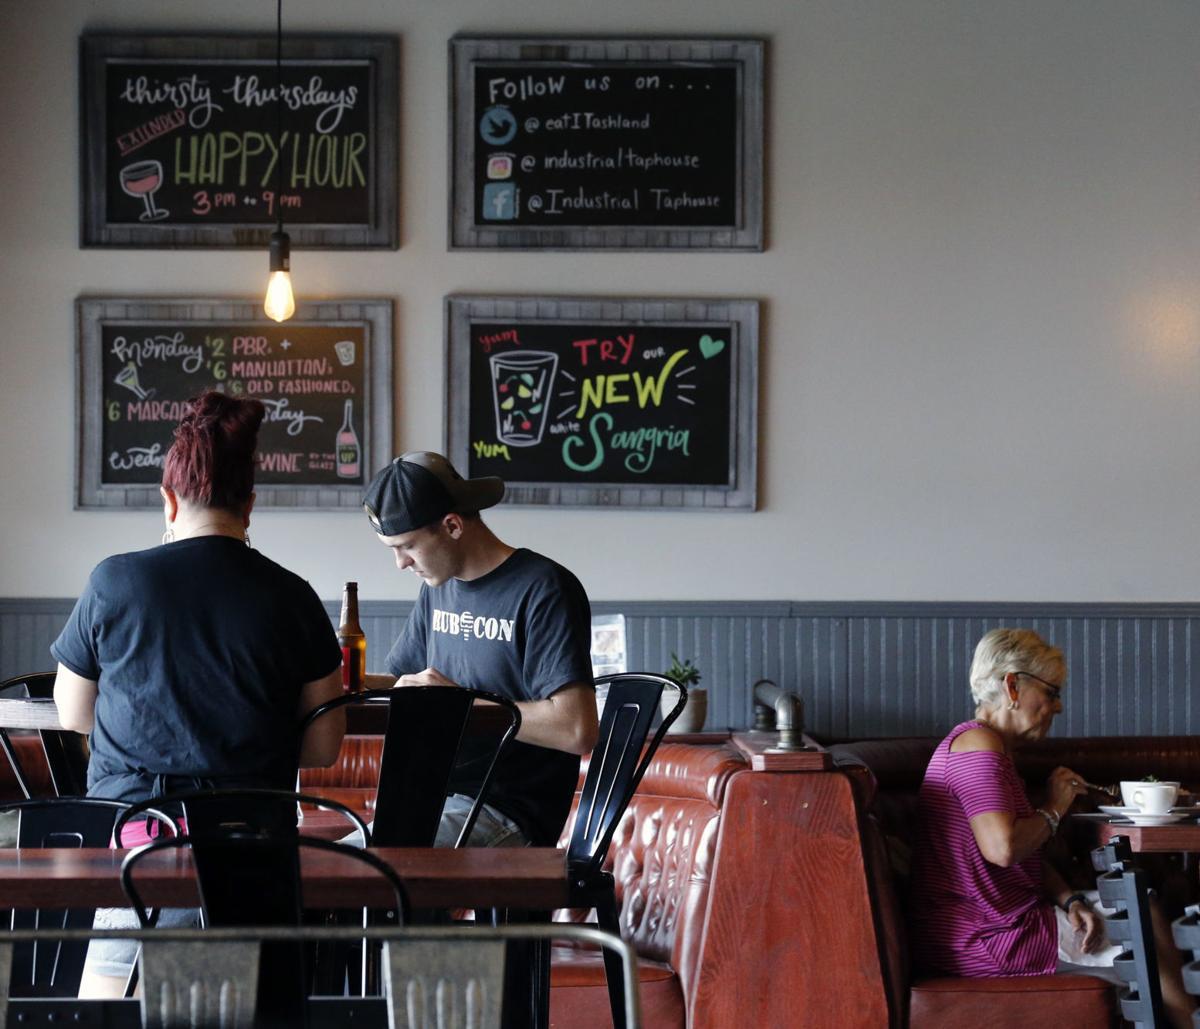 Restraunts Open Near Rosenberg, Texas Christmas Day 2020 Richmond restaurants open on Christmas Day 2019   Restaurant News